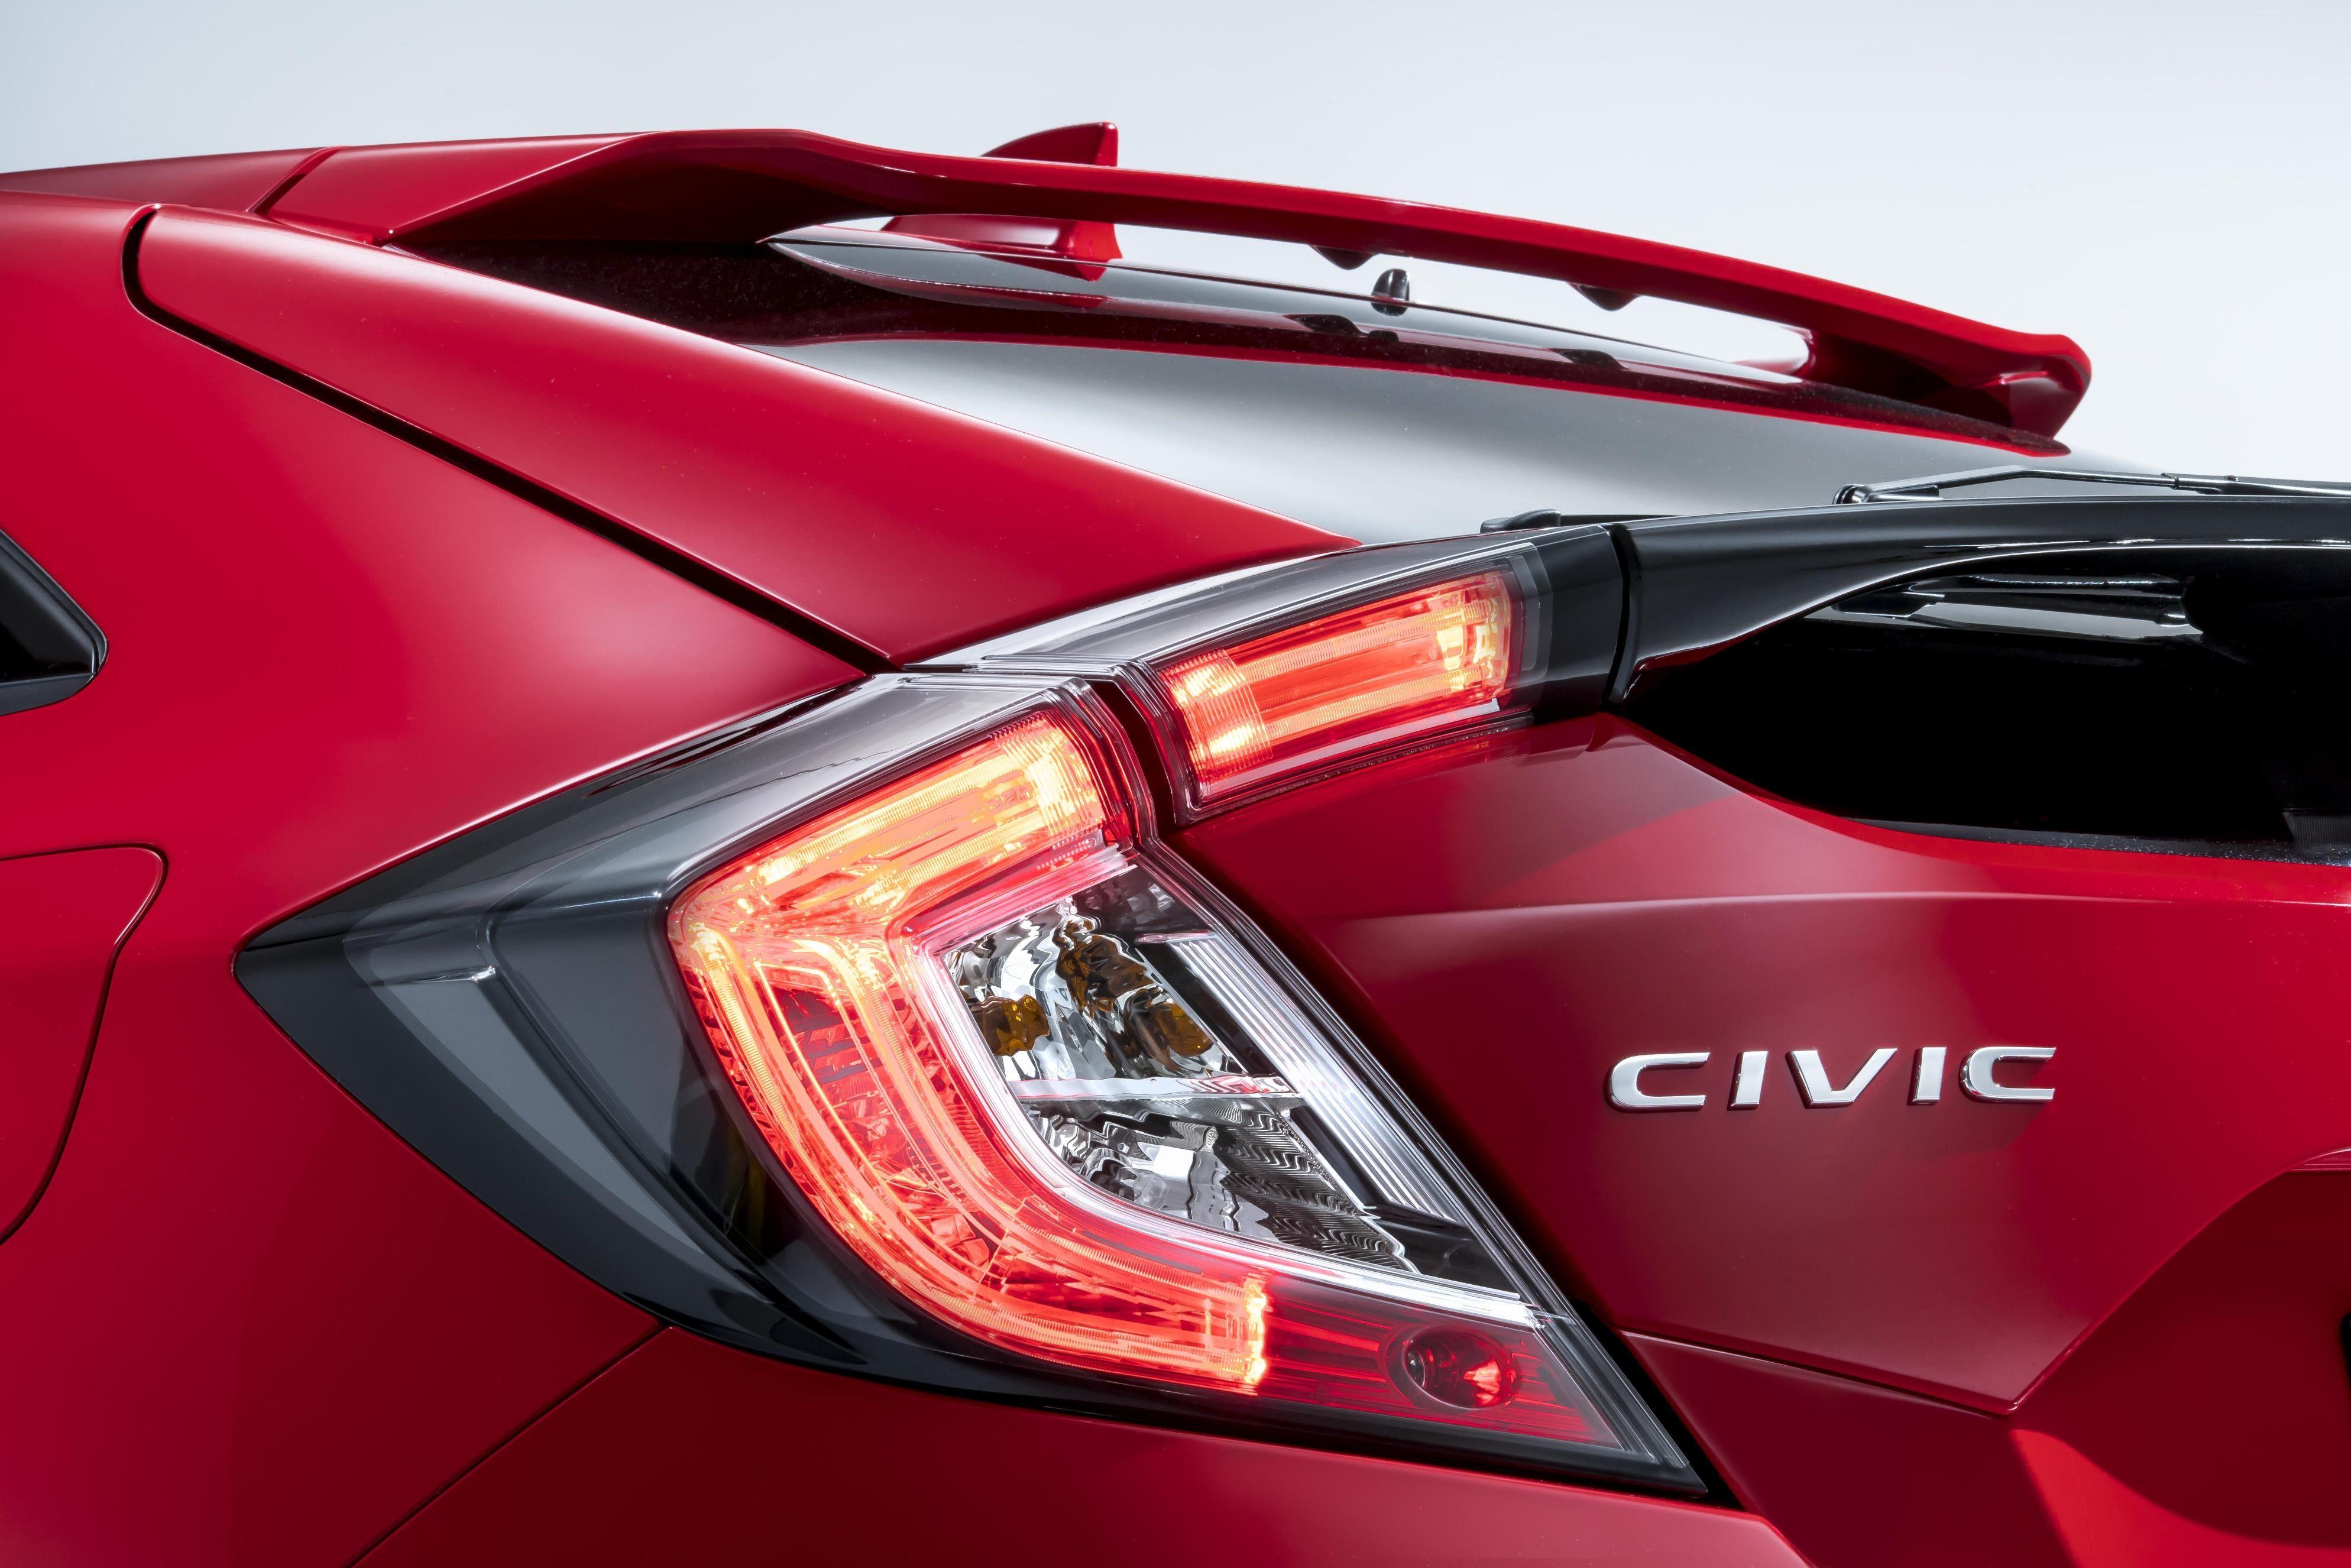 19 Luxury Mazda E 2020 Pricing Honda civic hatchback